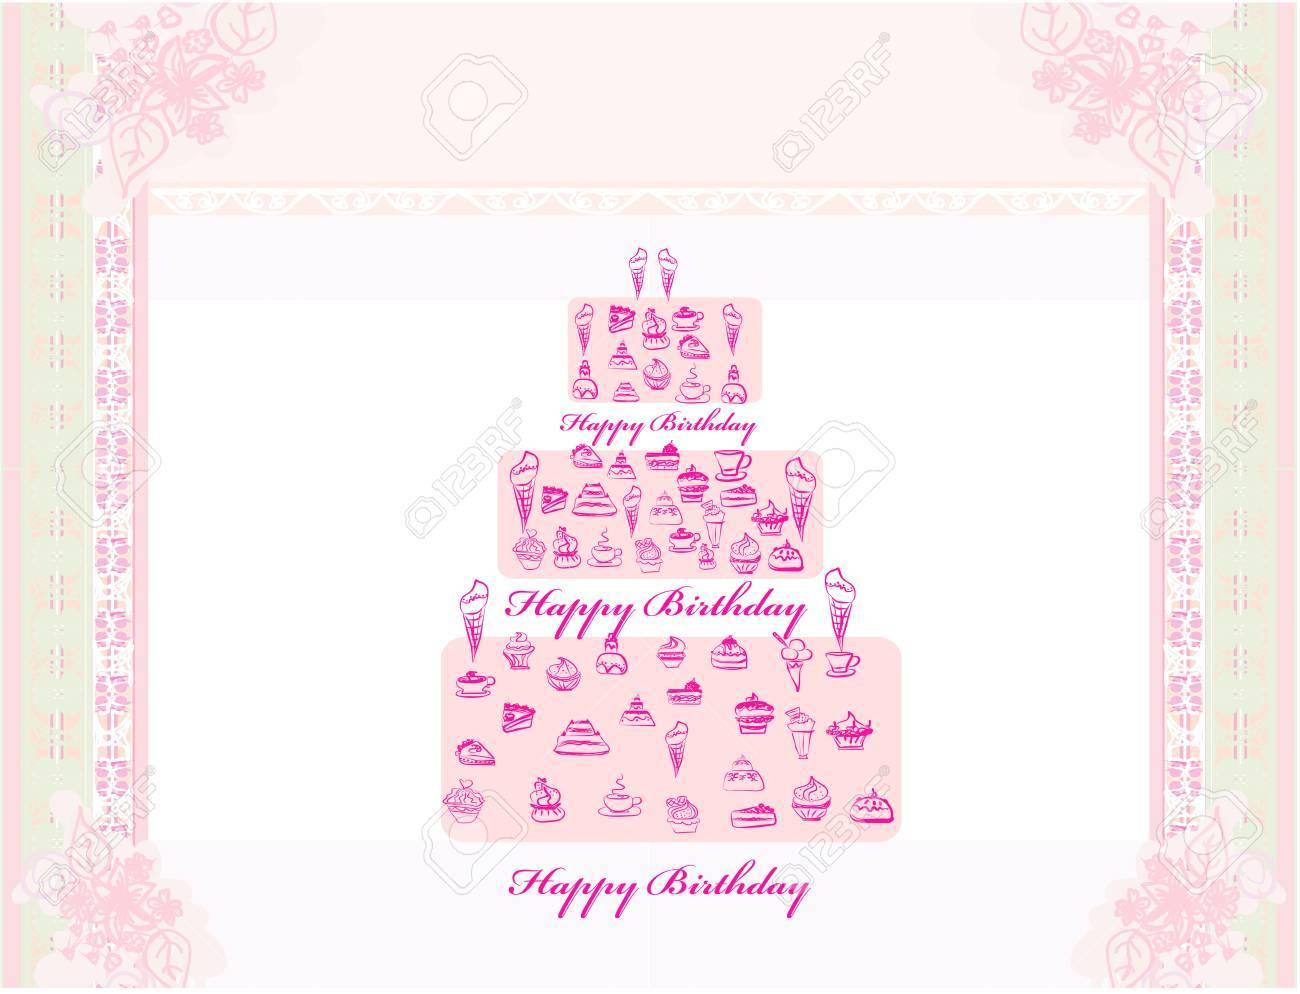 Happy Birthday Card Stock Vector - 13254155